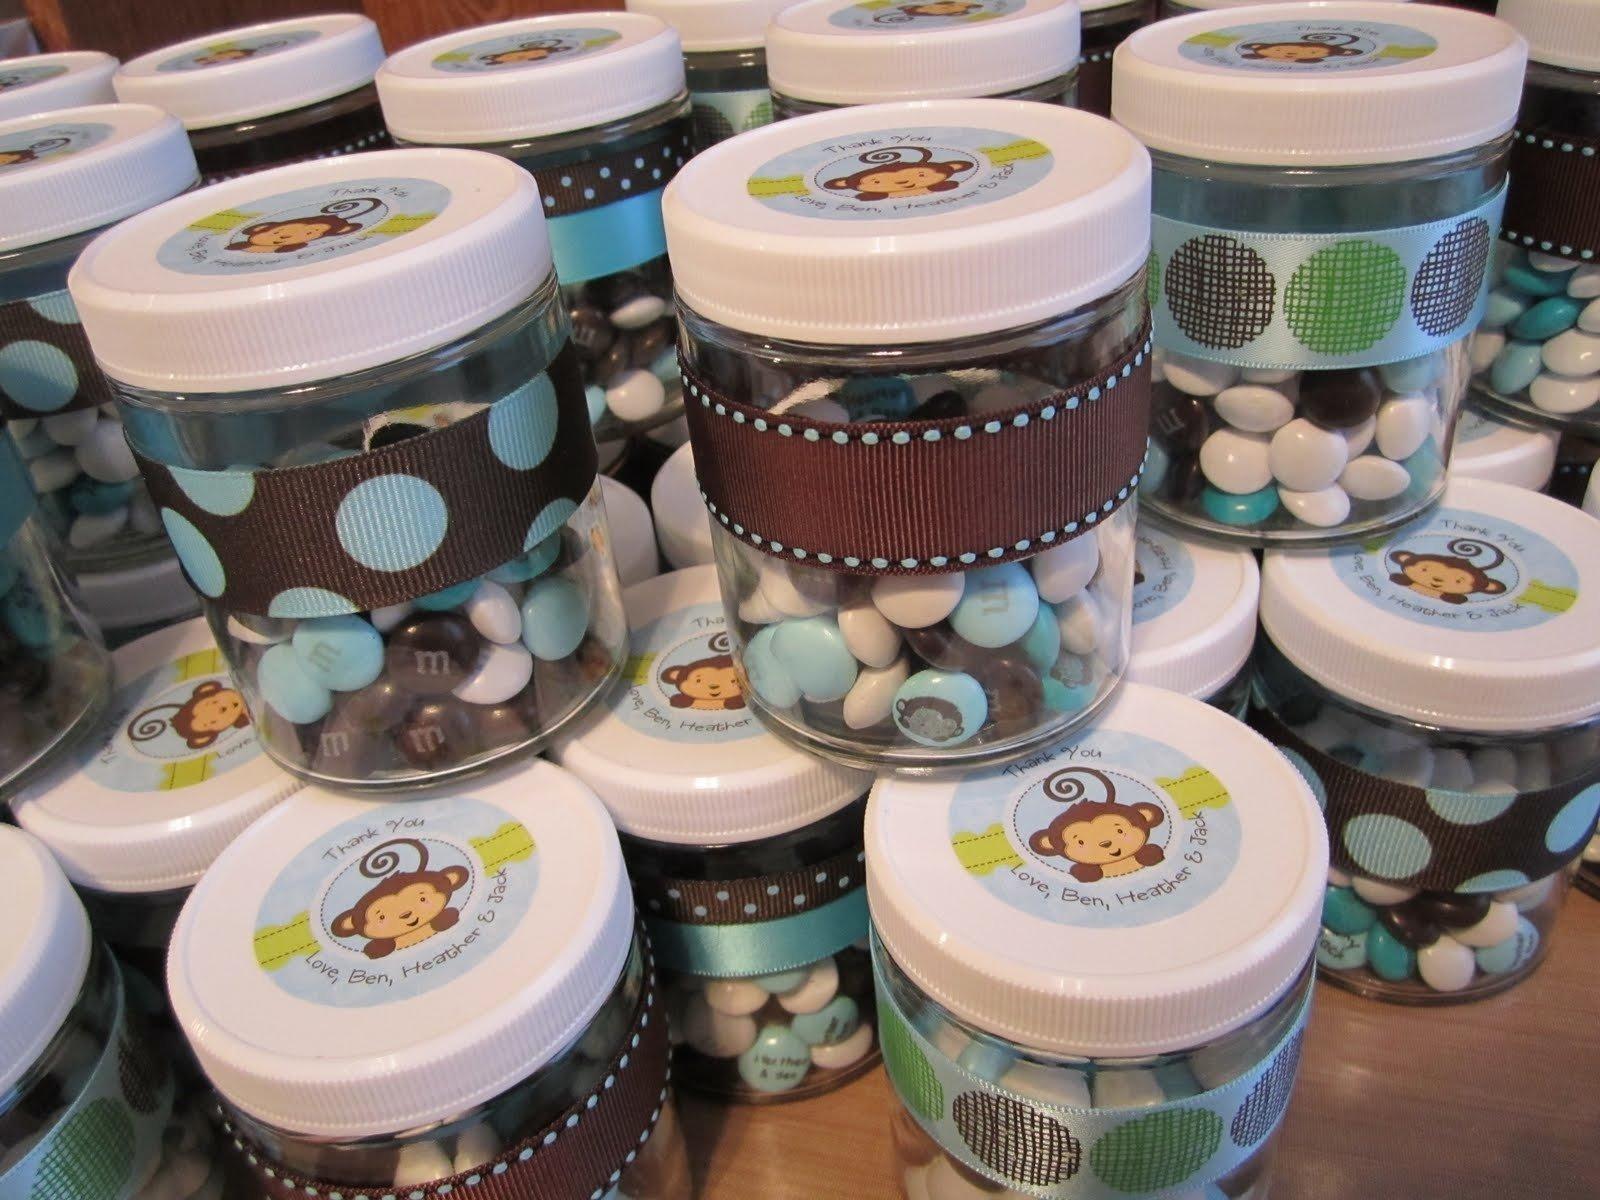 10 Most Popular Monkey Themed Baby Shower Ideas photo monkey baby shower gift image 1 2020